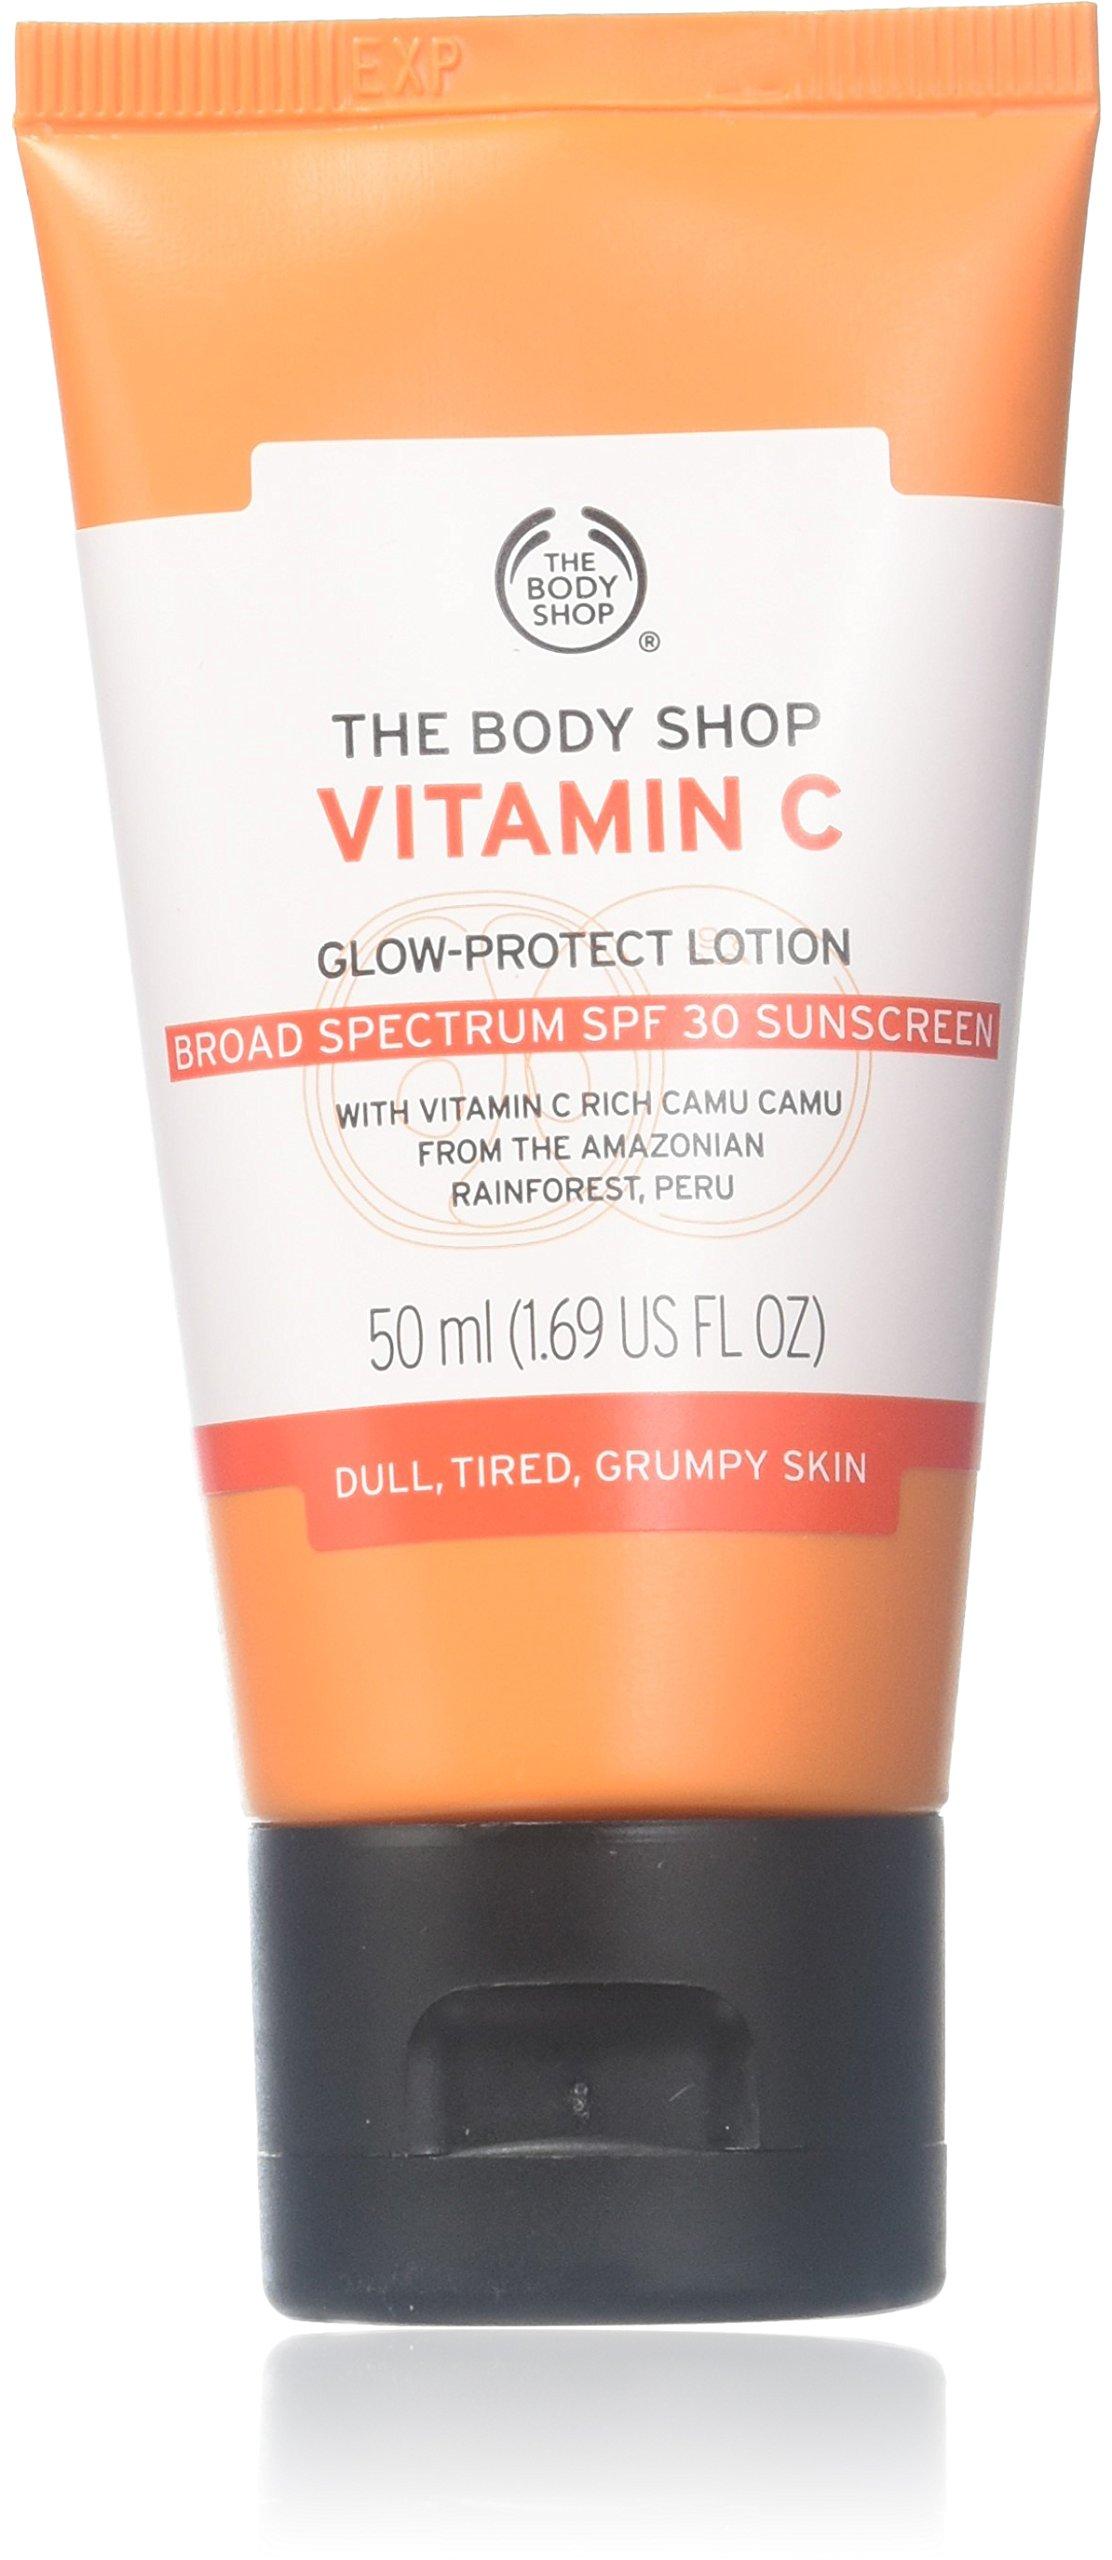 The Body Shop Vitamin C Glow-Protect Lotion SPF 30, 1.69 FL Oz